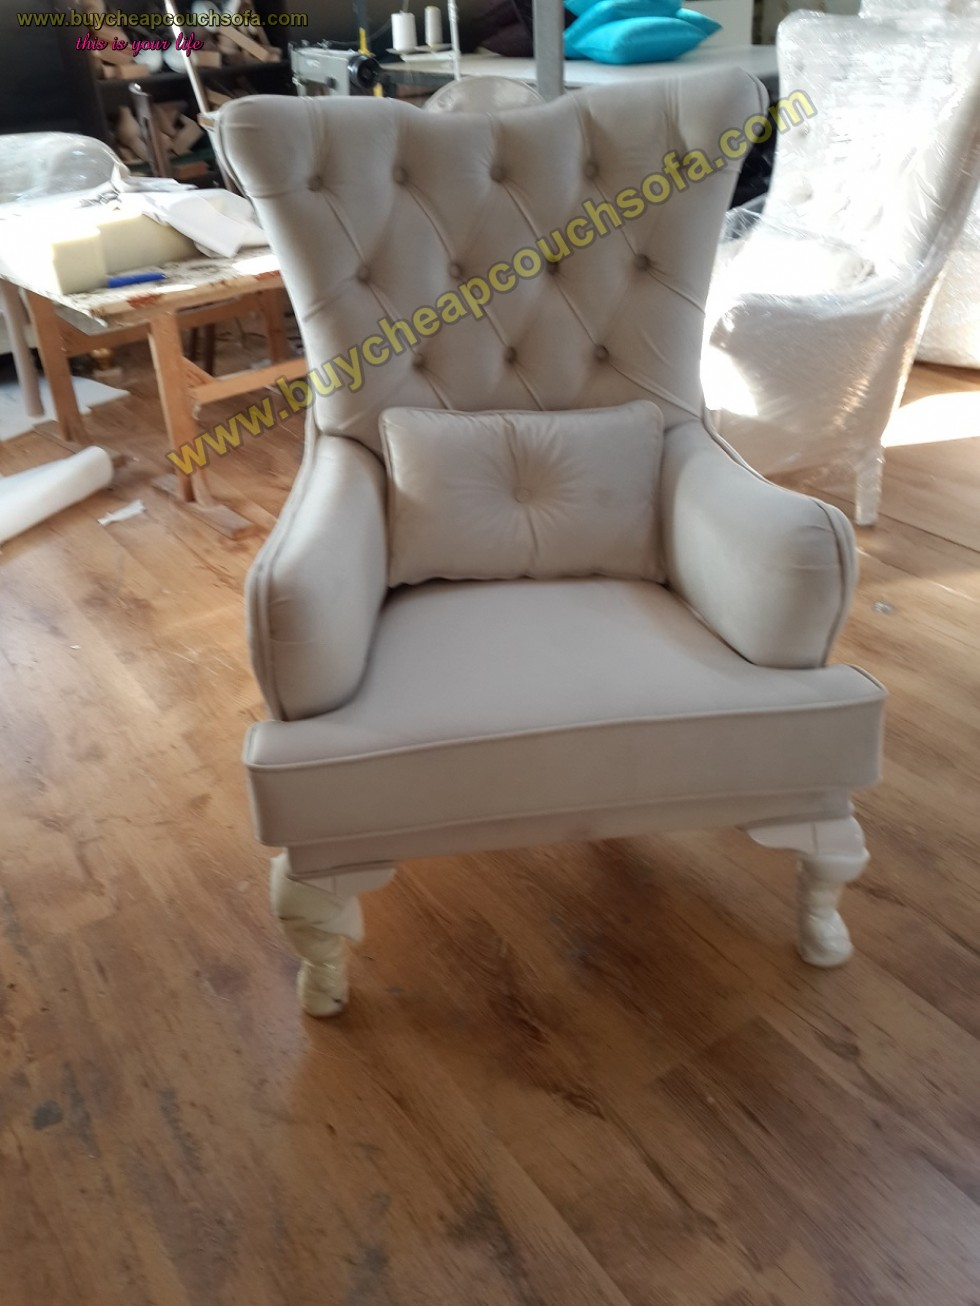 Kodu: 10206 - Velvet Luxury Accent Chair Wingback Chair White Tufted